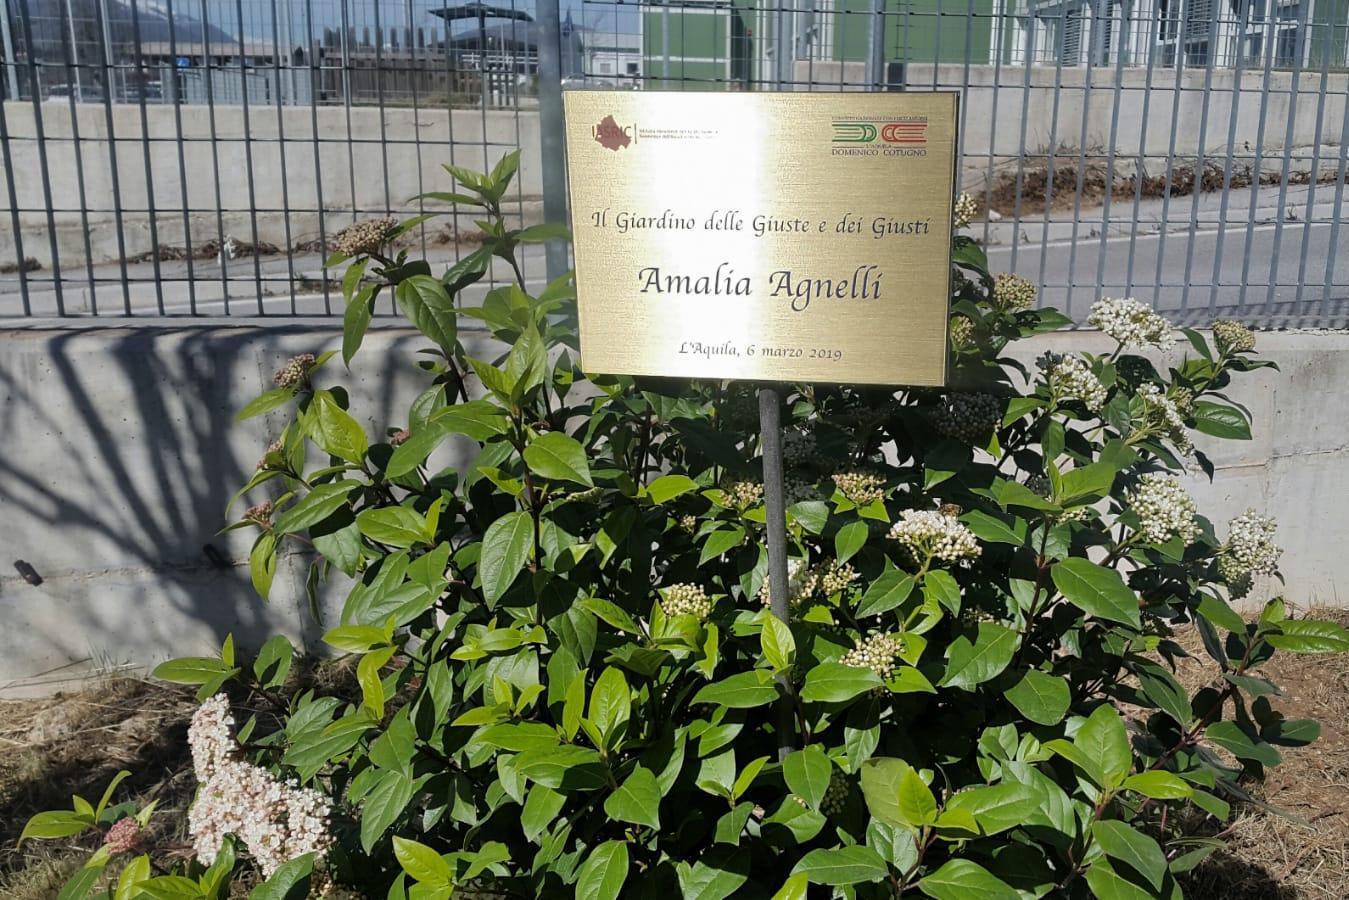 La targa per Amalia Agnelli